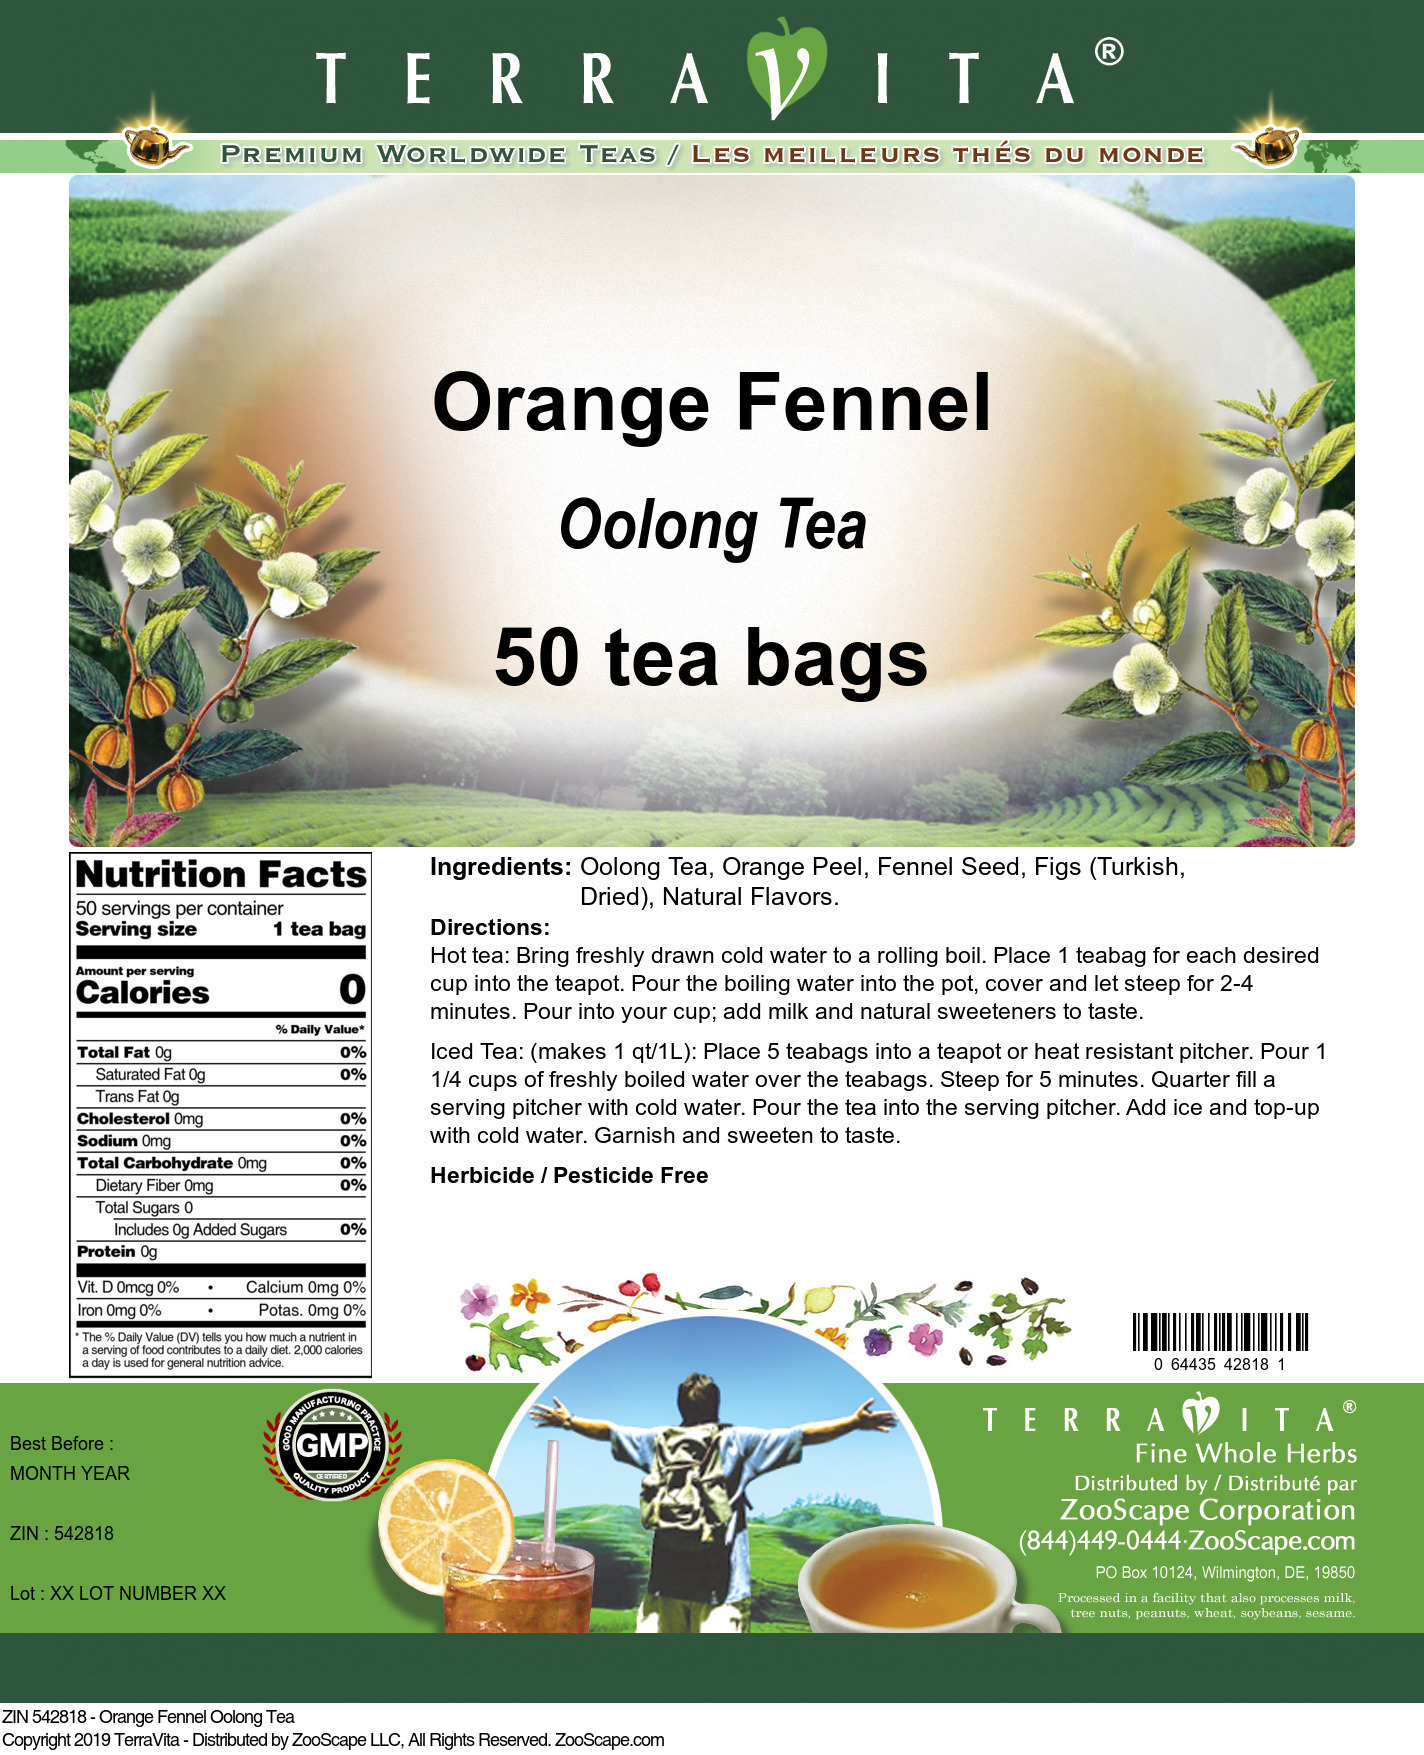 Orange Fennel Oolong Tea